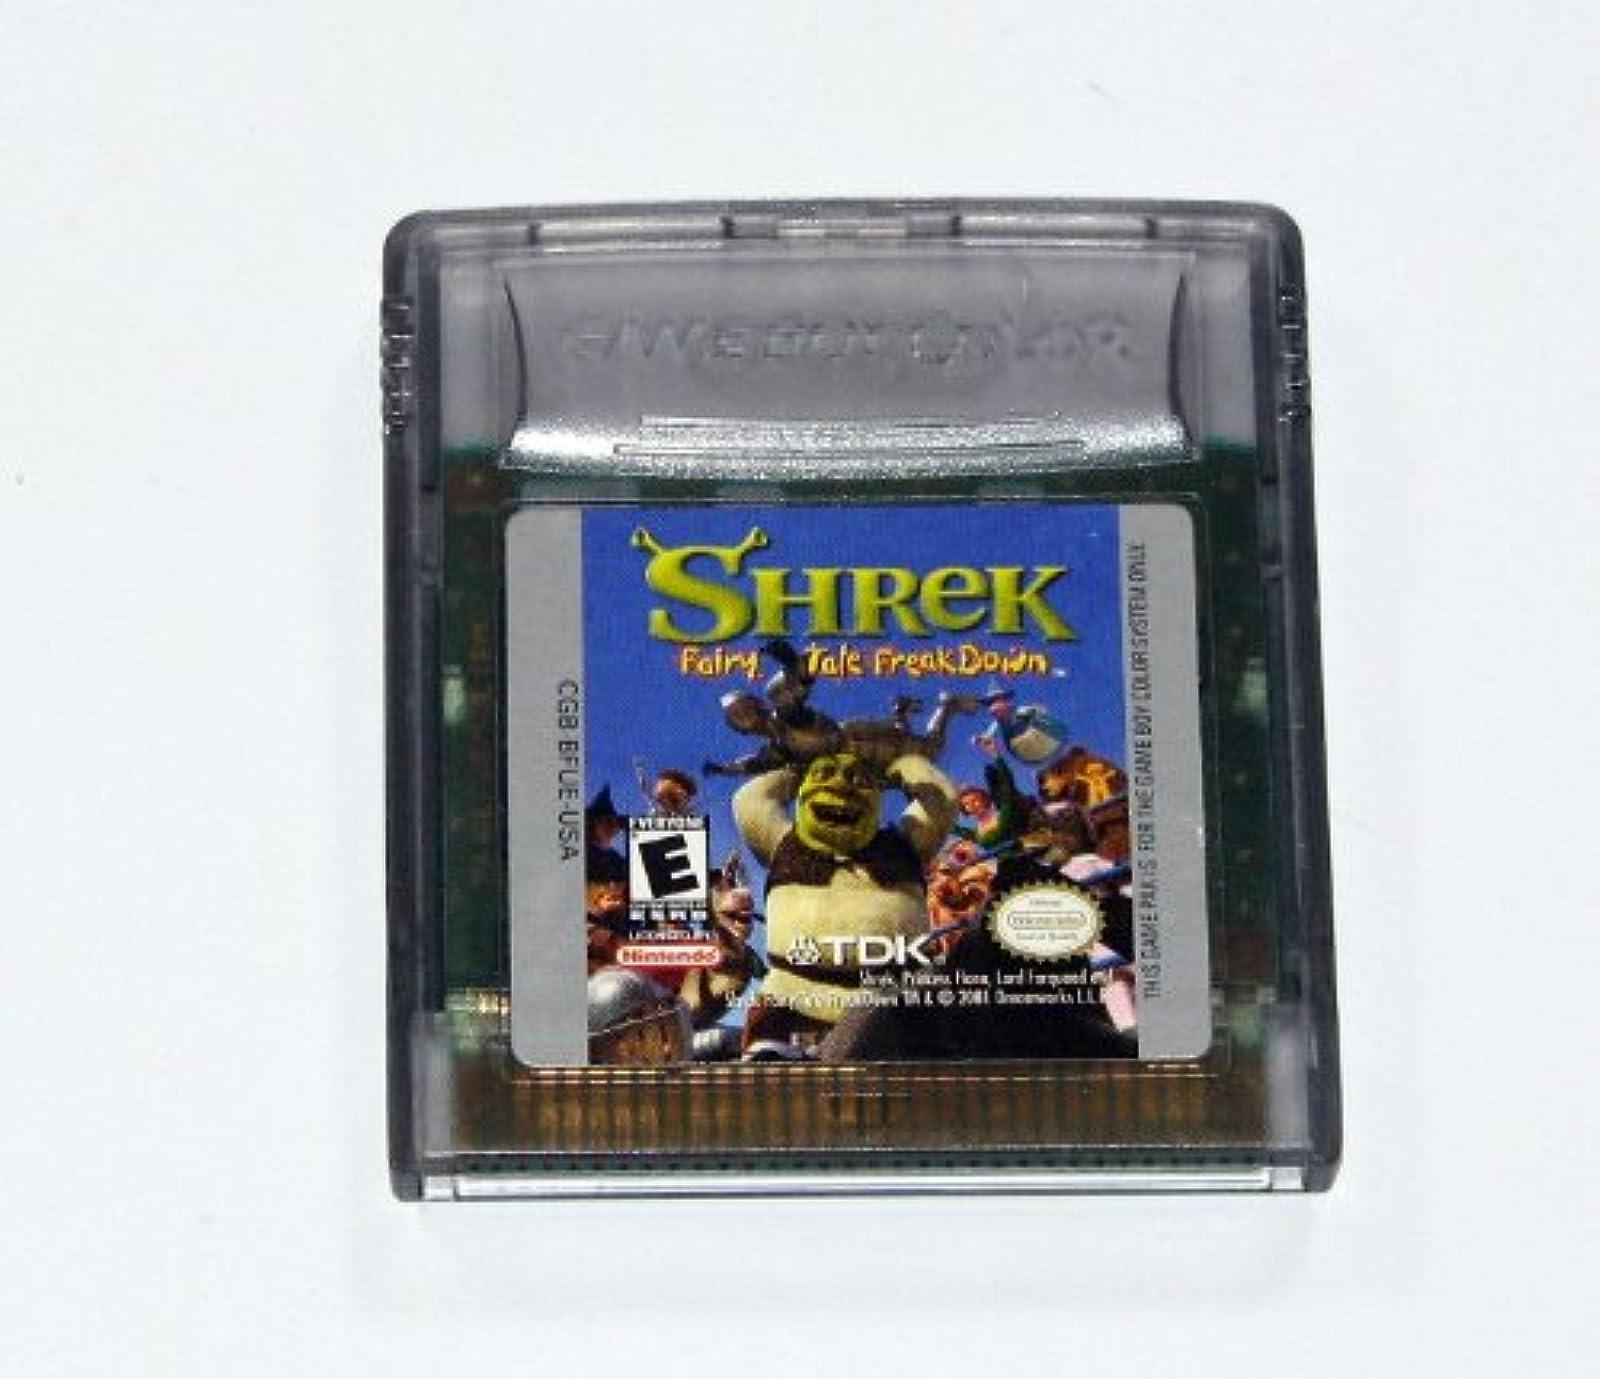 Shrek: Fairy Tale Freakdown On Gameboy Color